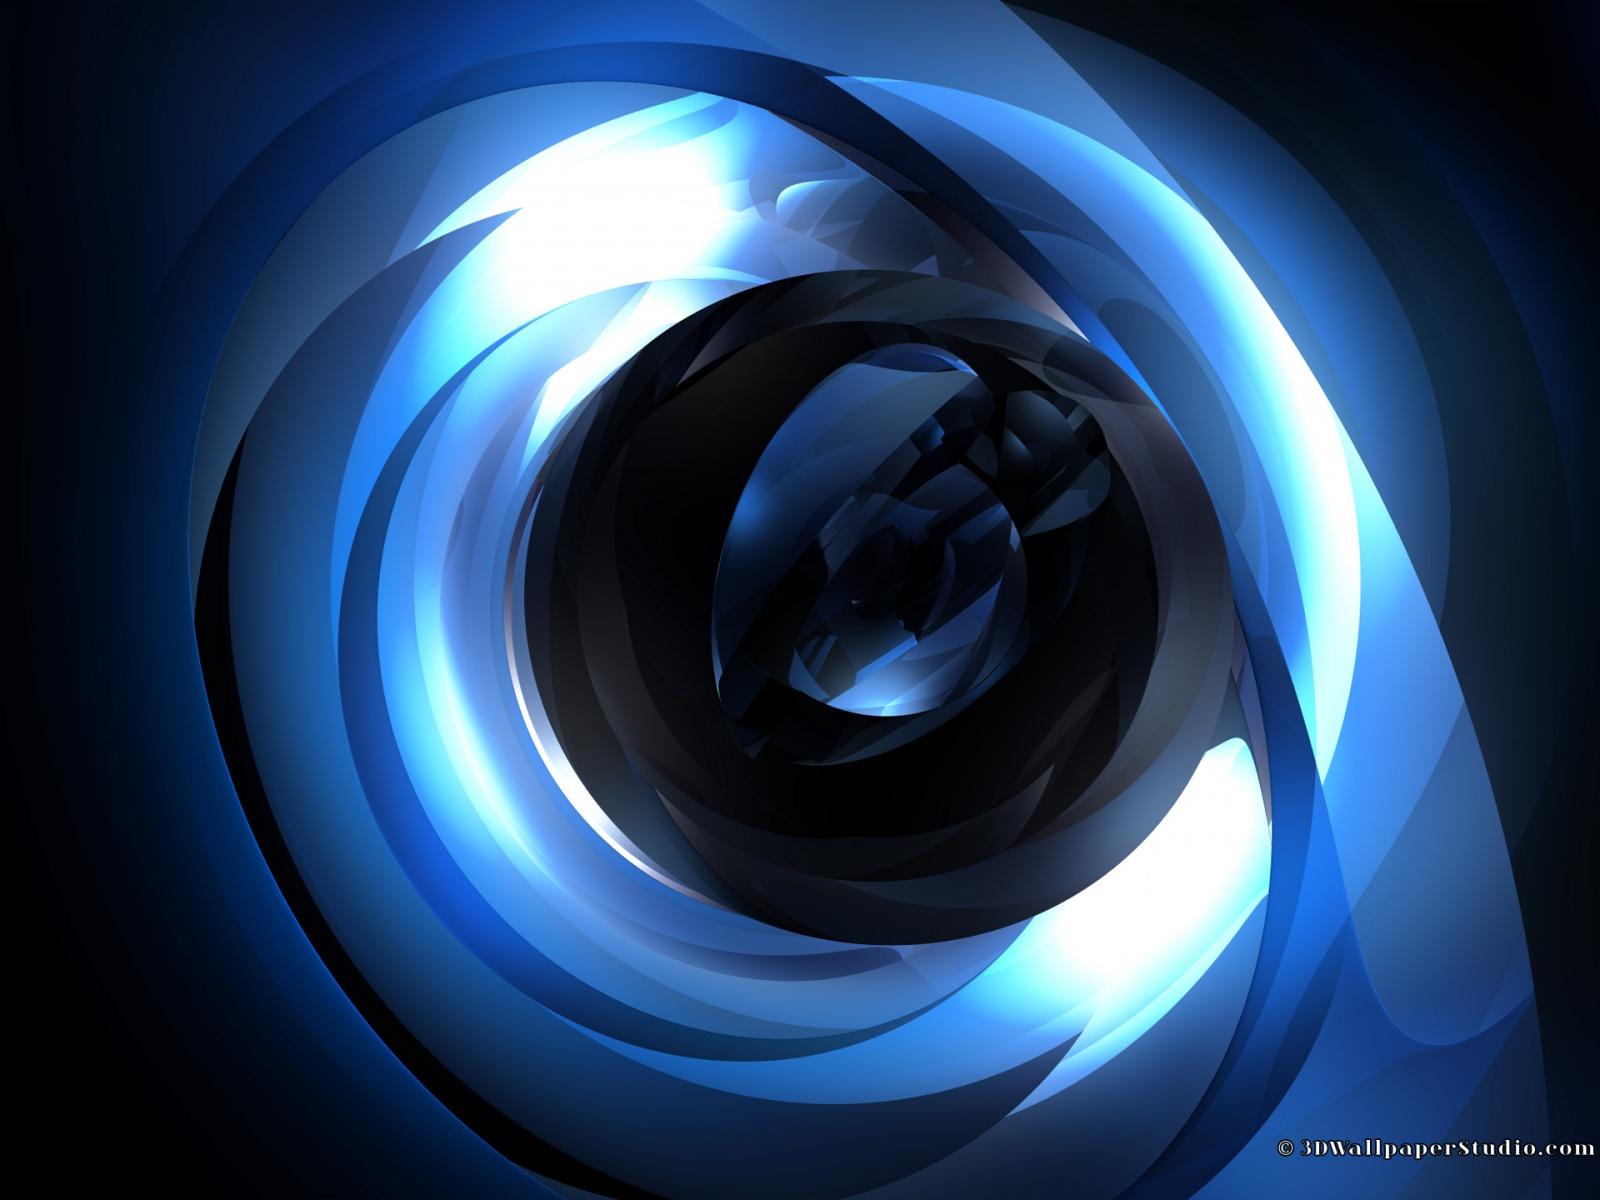 3D Wallpaper Blue centroid 3D 1600 x 1200 1600x1200